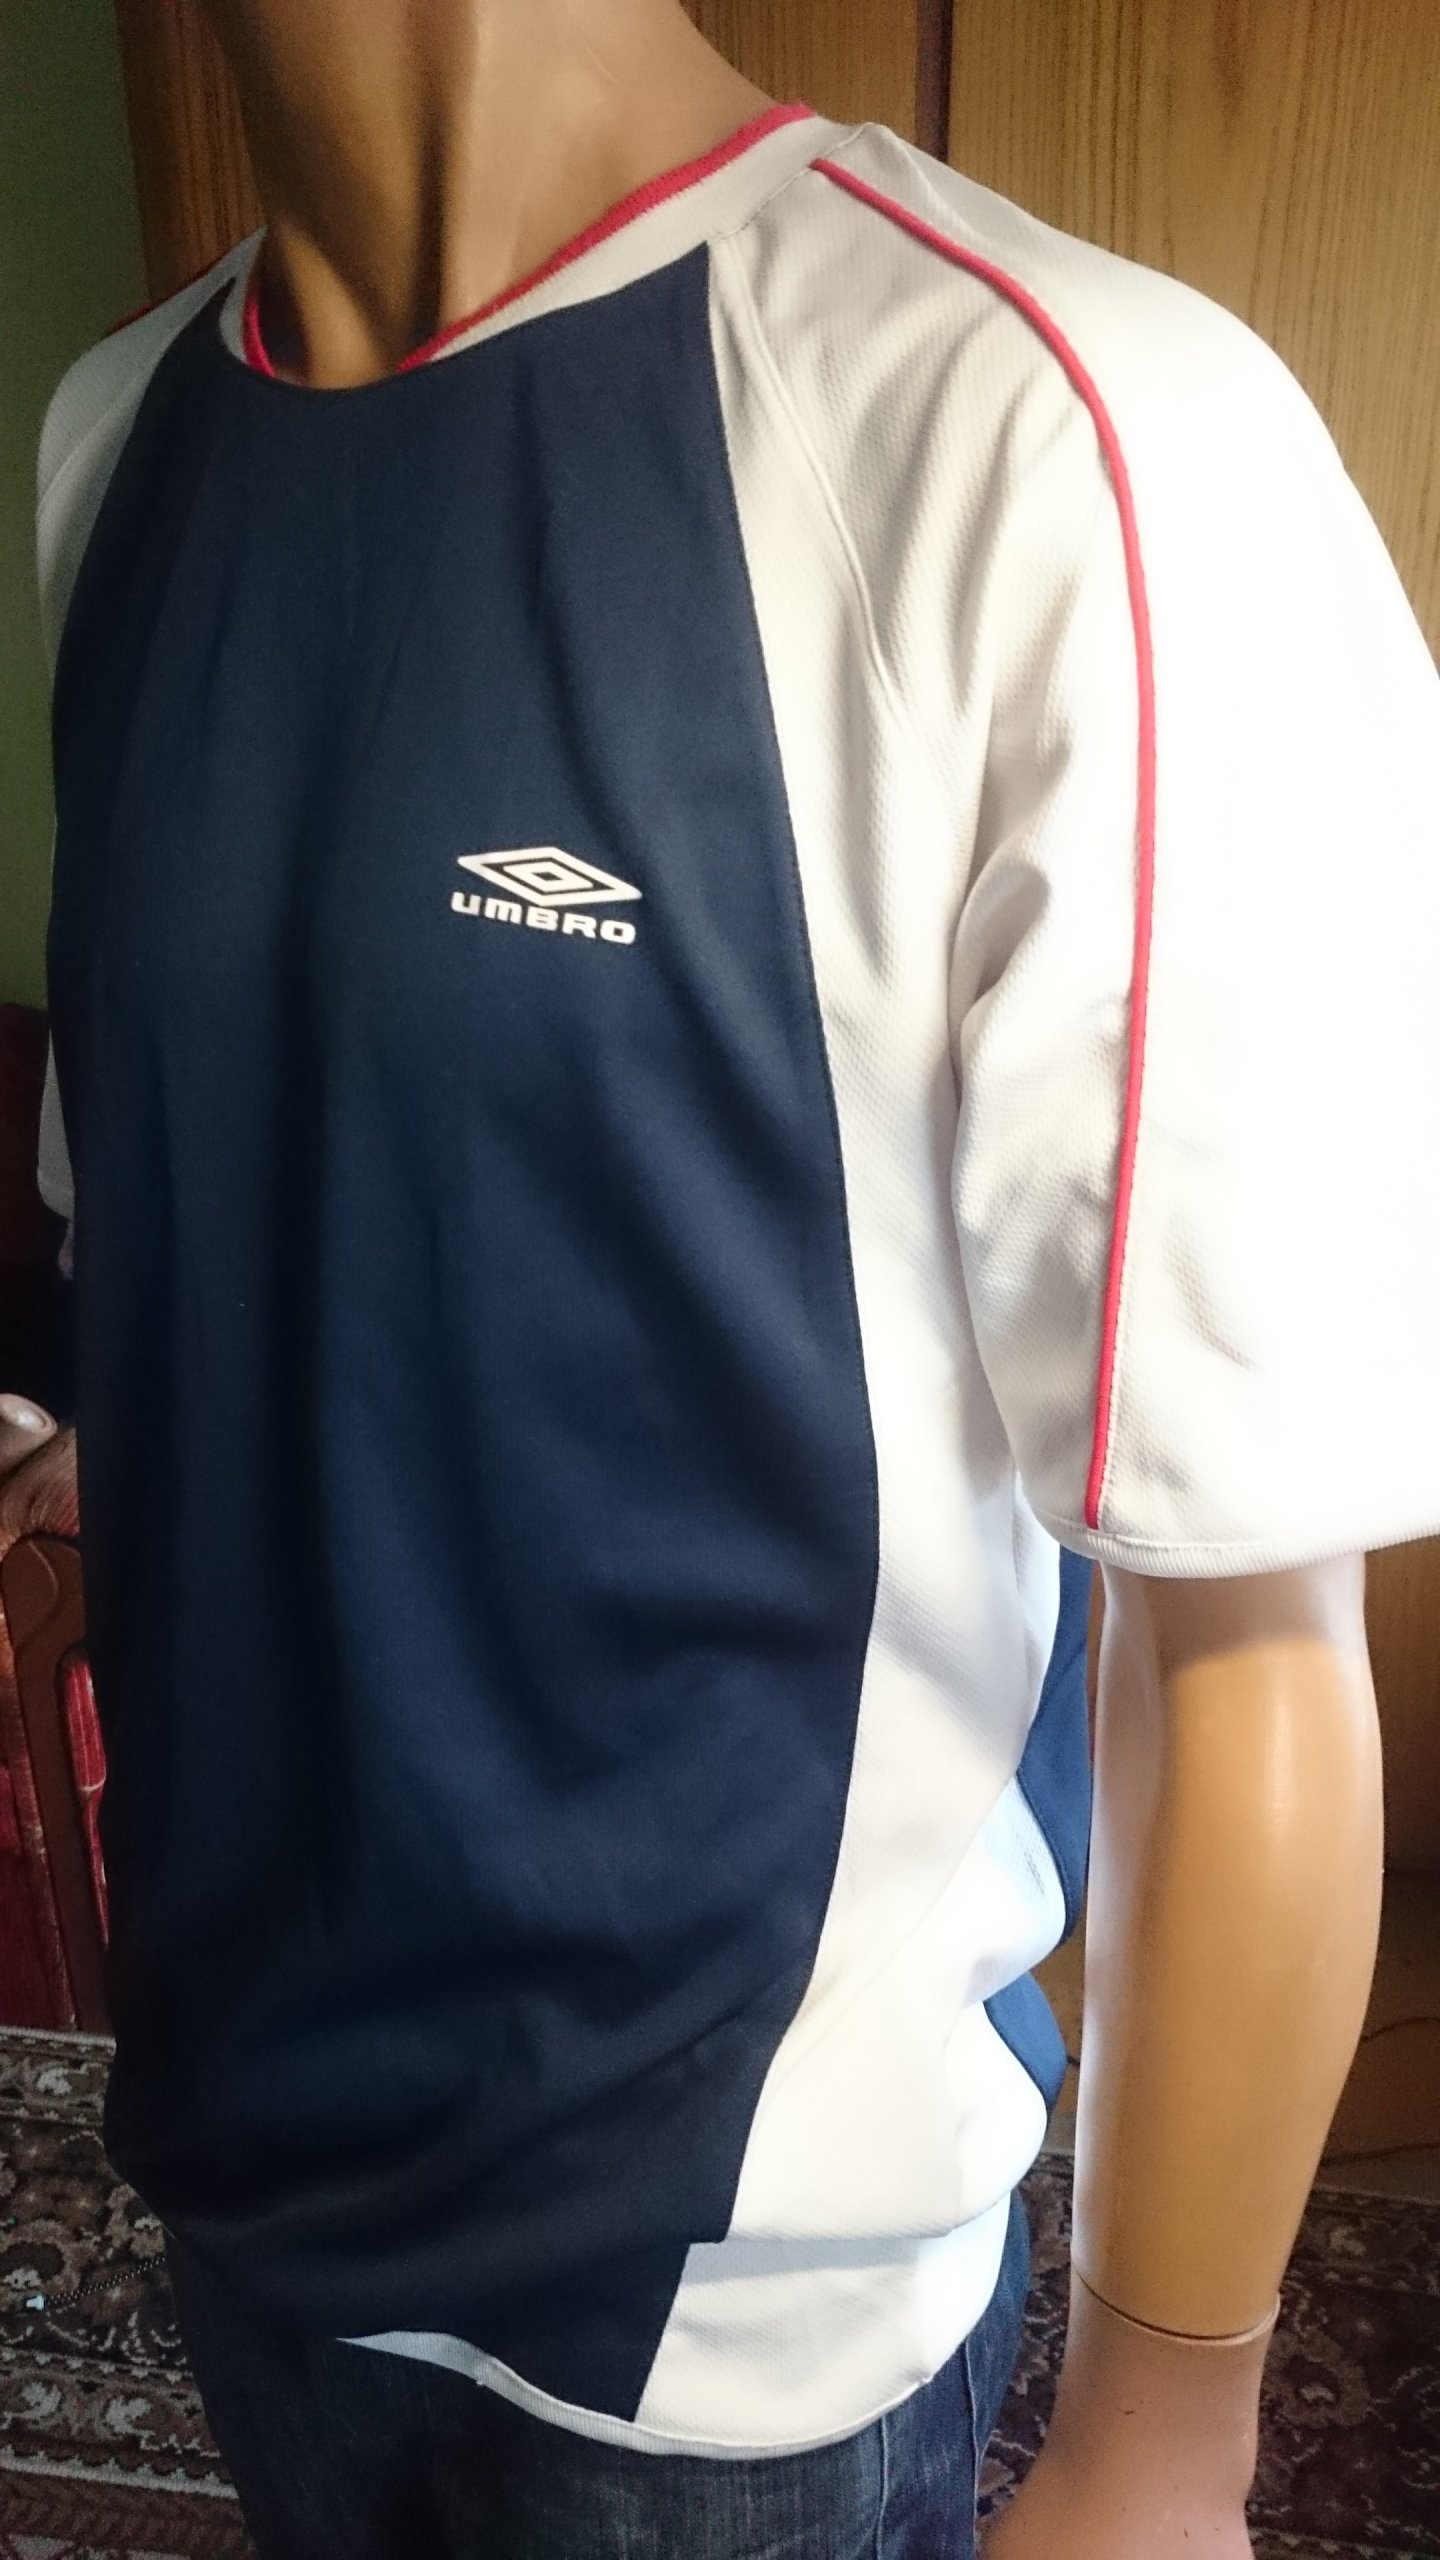 UMBRO koszula sportowa koszulka T-shirt L